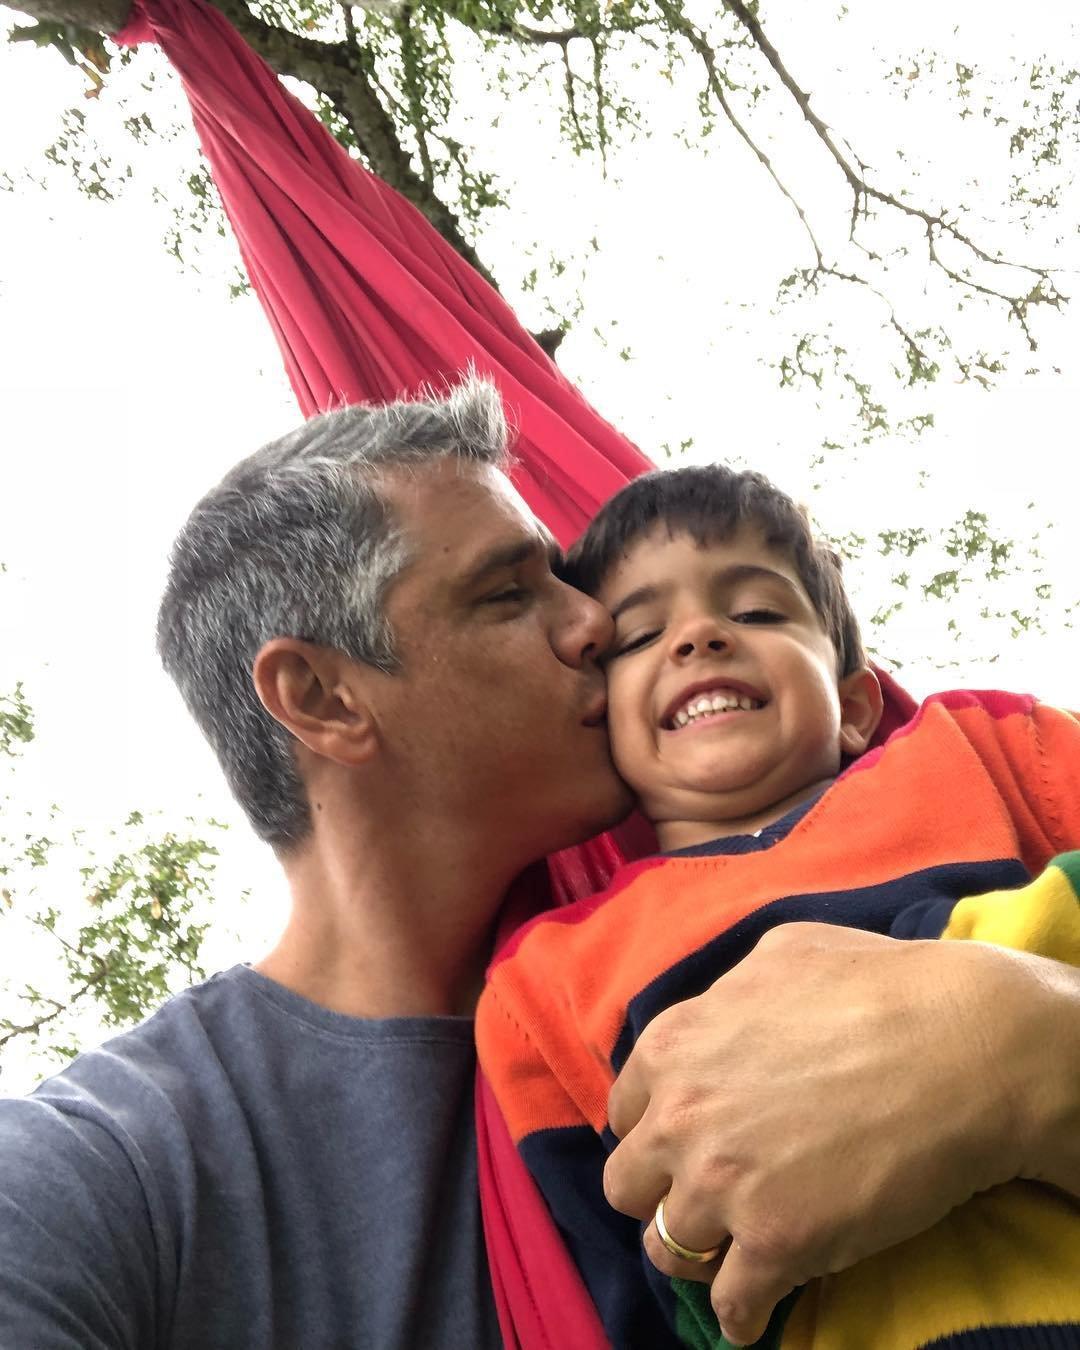 39047505 312242702859815 4035777663342739456 n.jpg?resize=648,365 - Márcio Garcia posta foto do filho nu e gera polêmica: Inapropriado ou inofensivo?